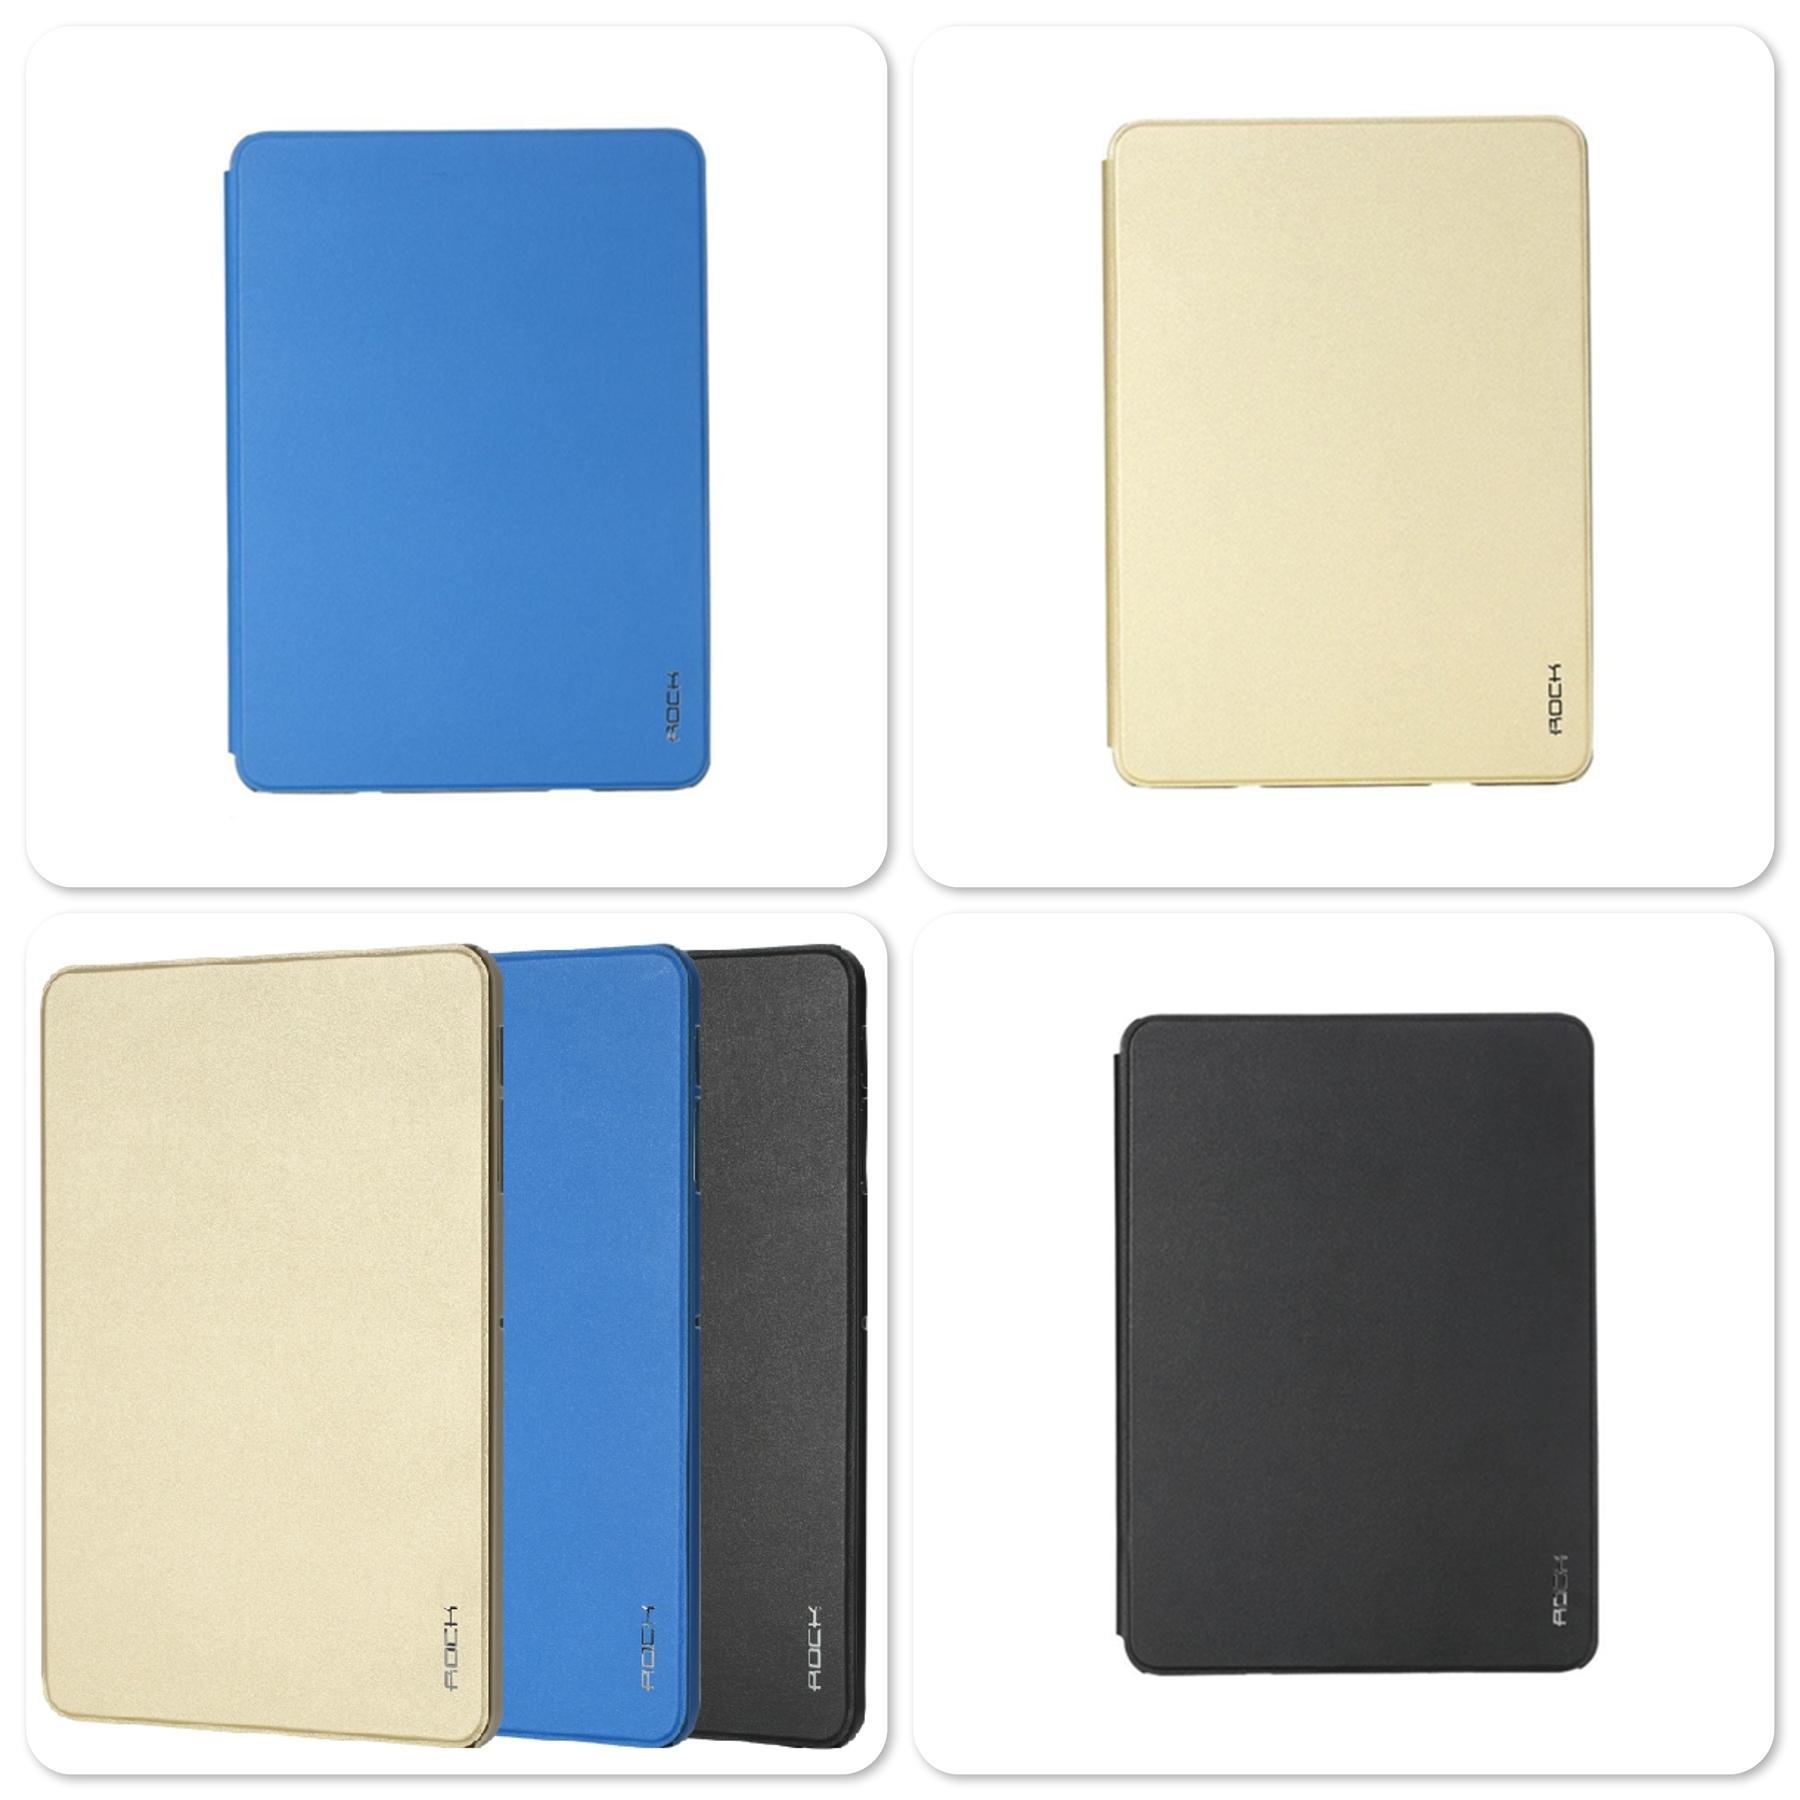 Bandingkan Harga Case For Samsung Galaxy Tab S2 80 Inch